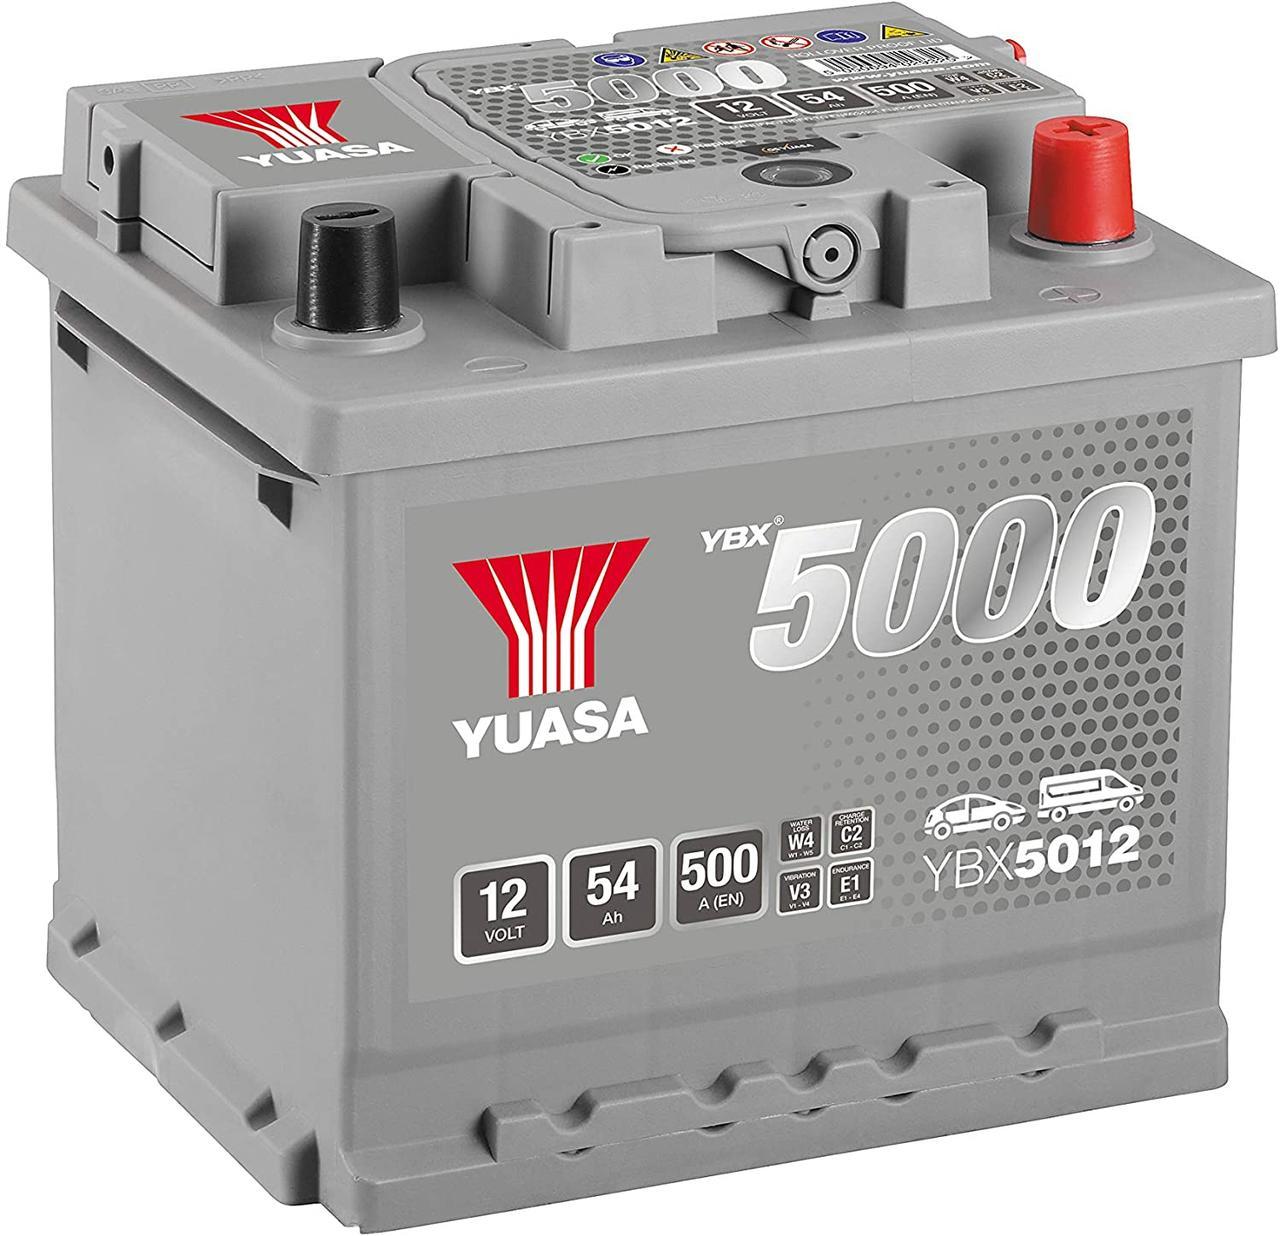 Yuasa 12V 54Ah Silver High Performance Battery (0)